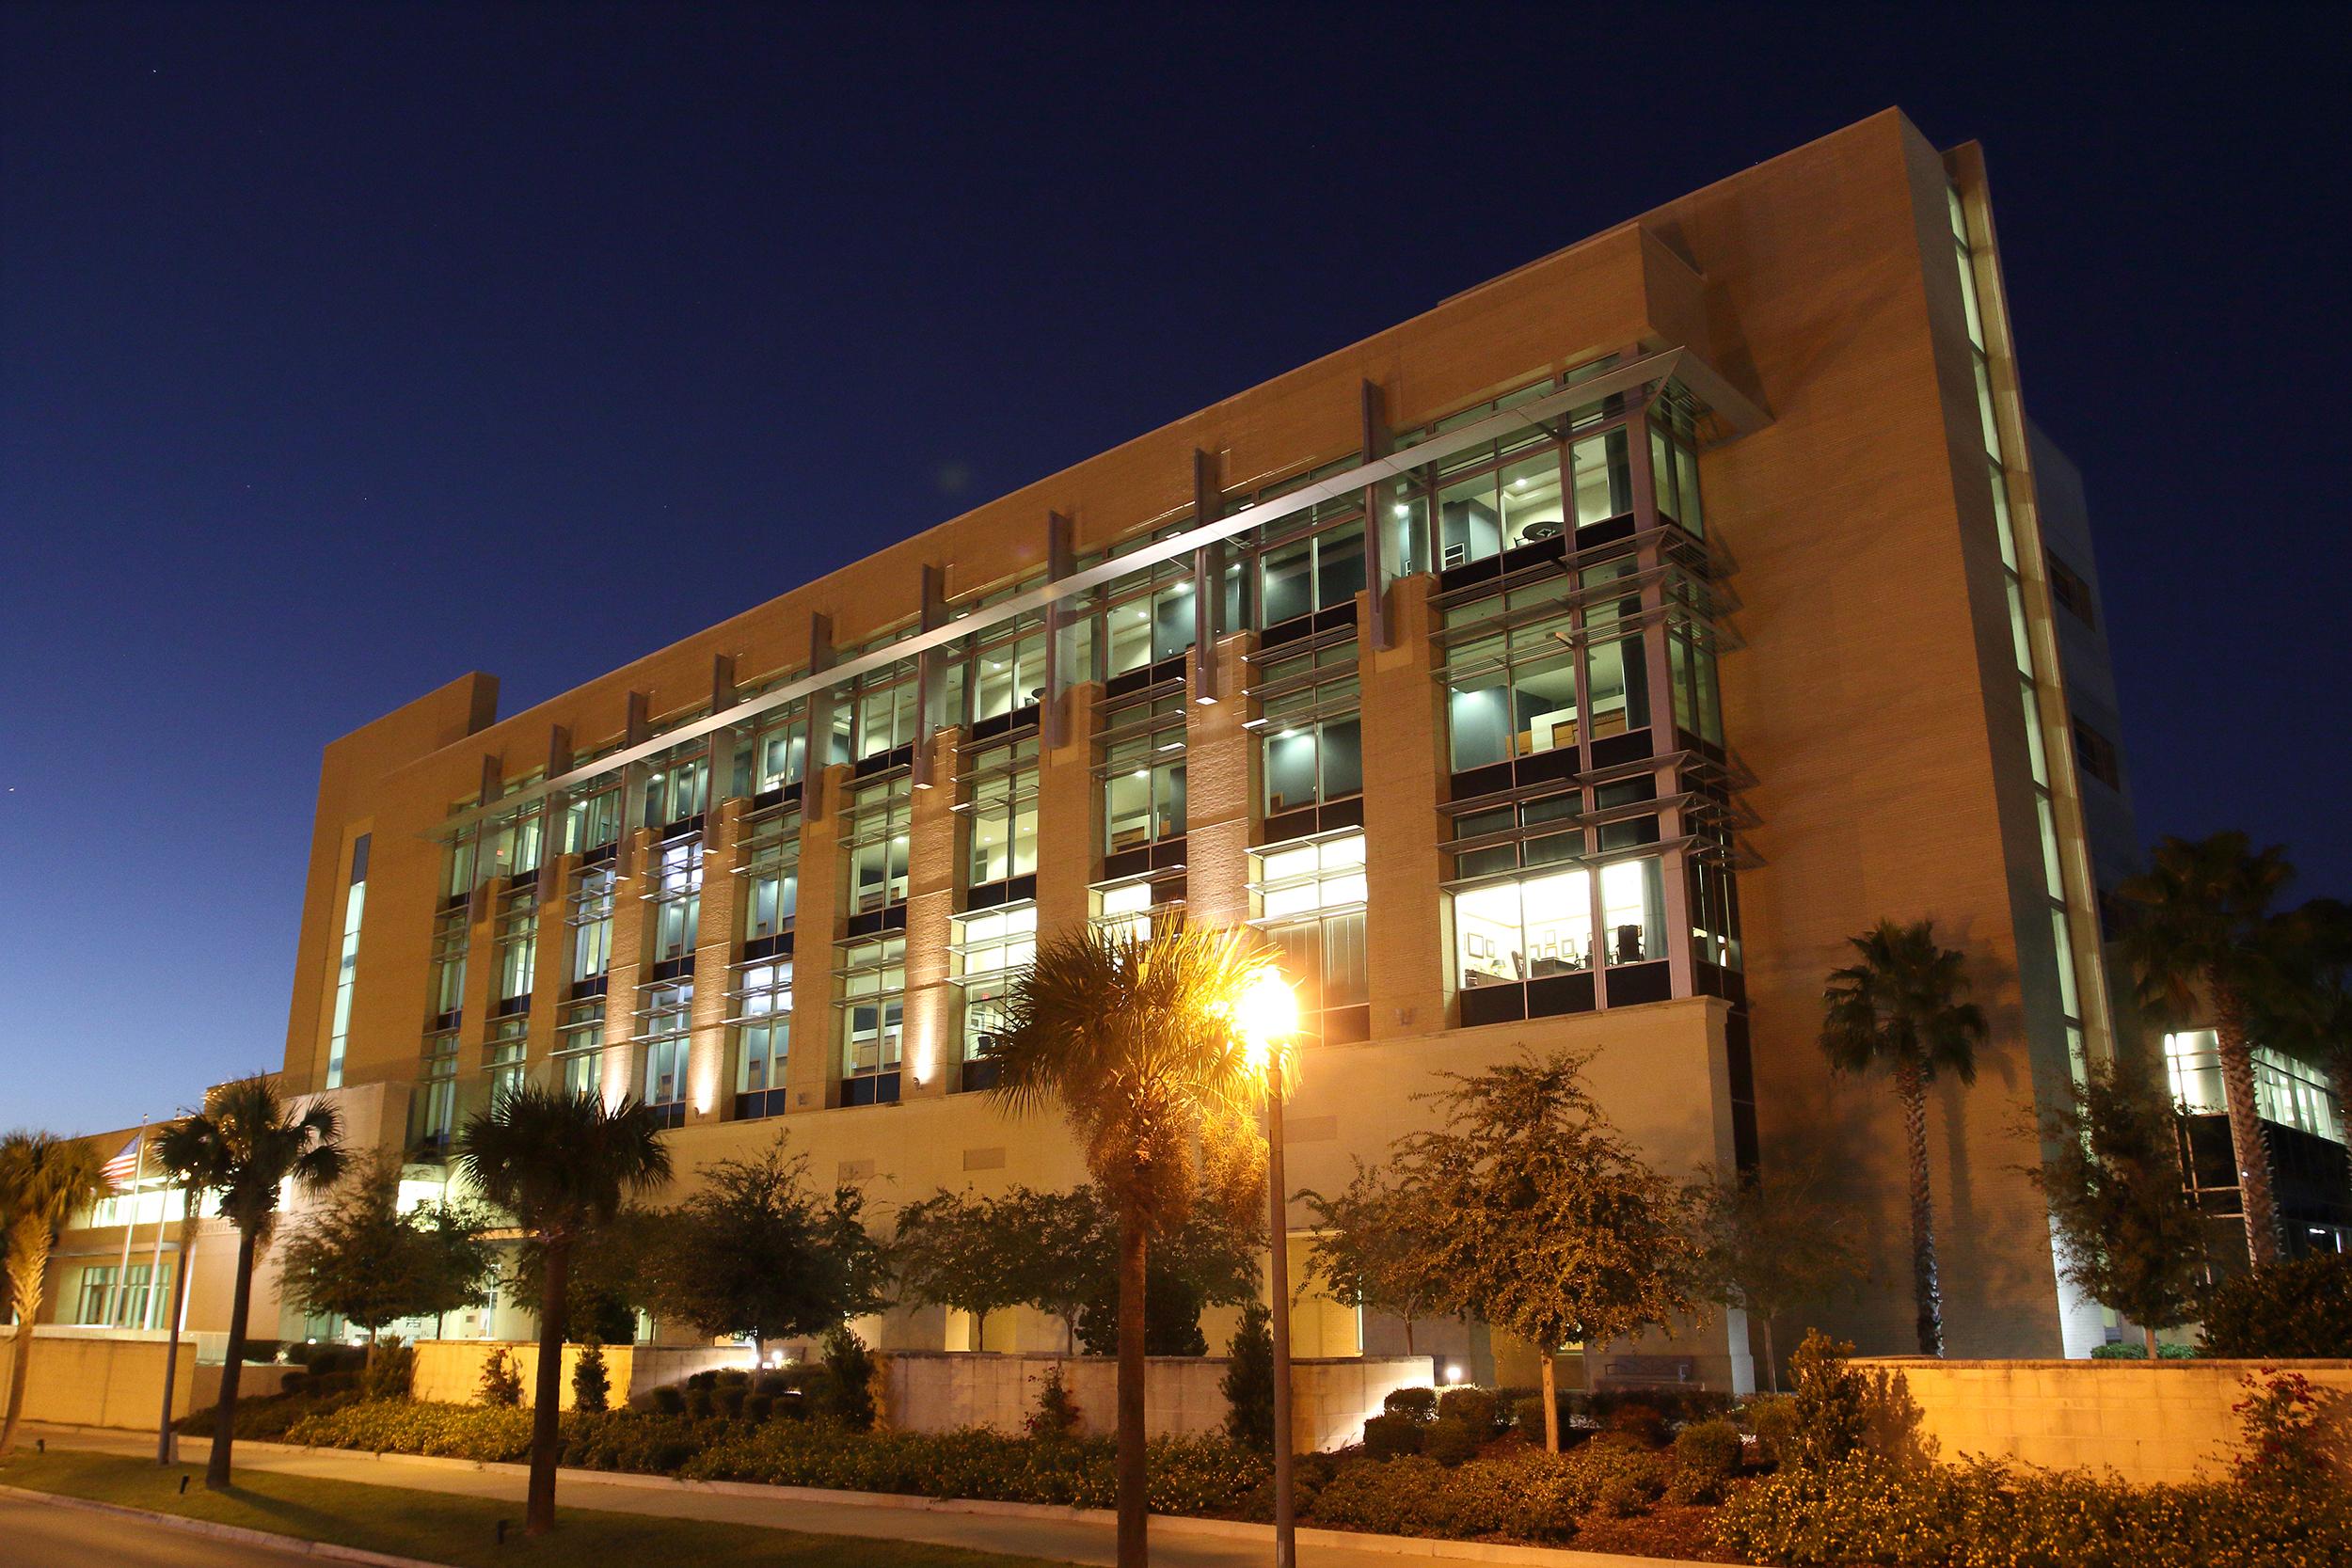 Lake County Judicial Center